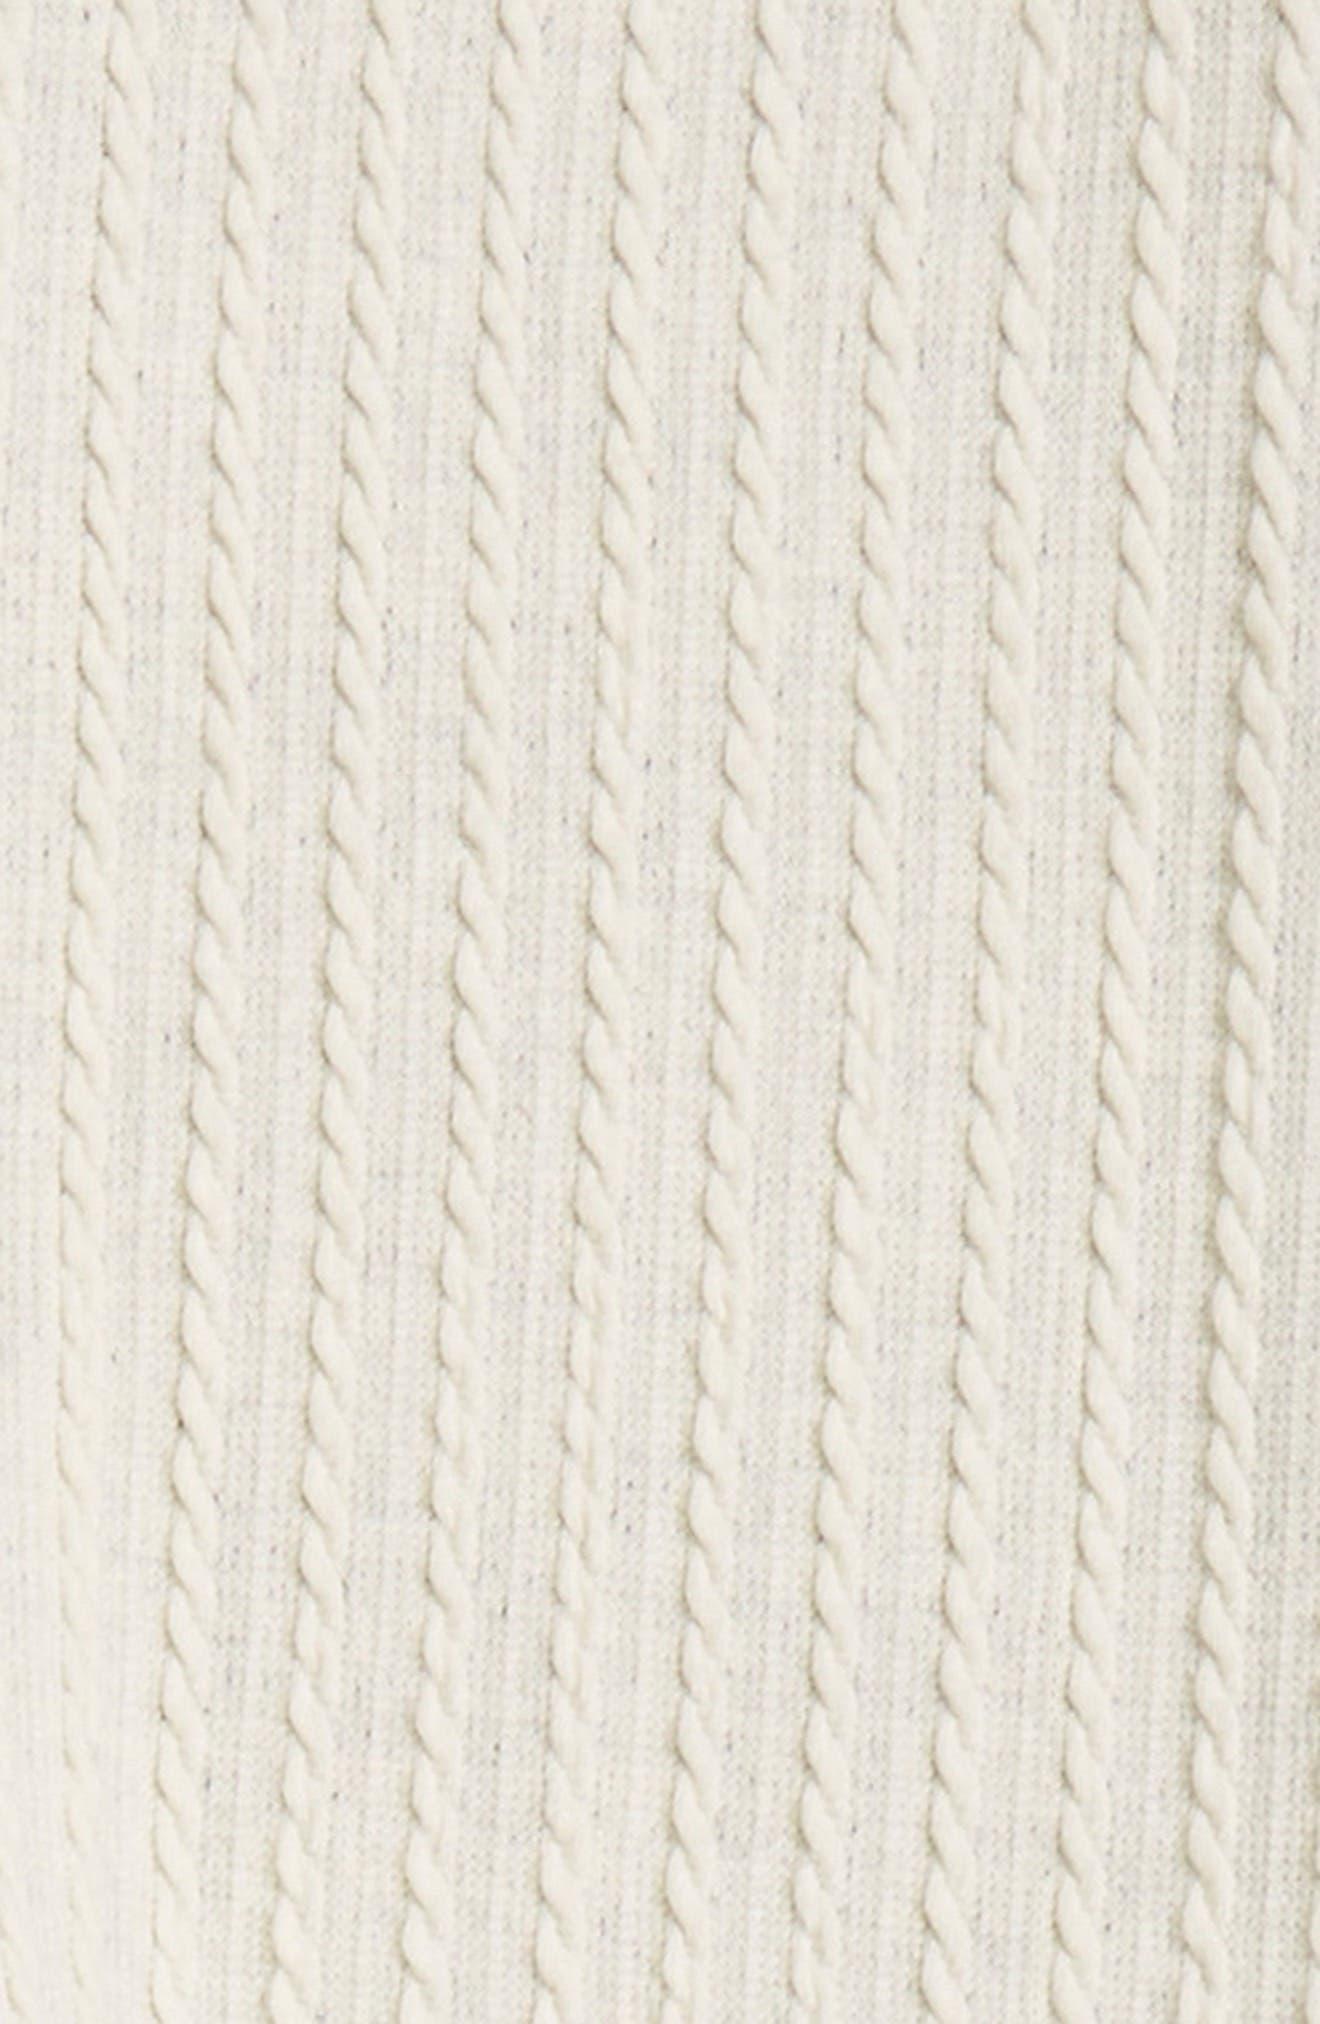 Cable Knit Leggings,                             Main thumbnail 1, color,                             IVORY EGRET